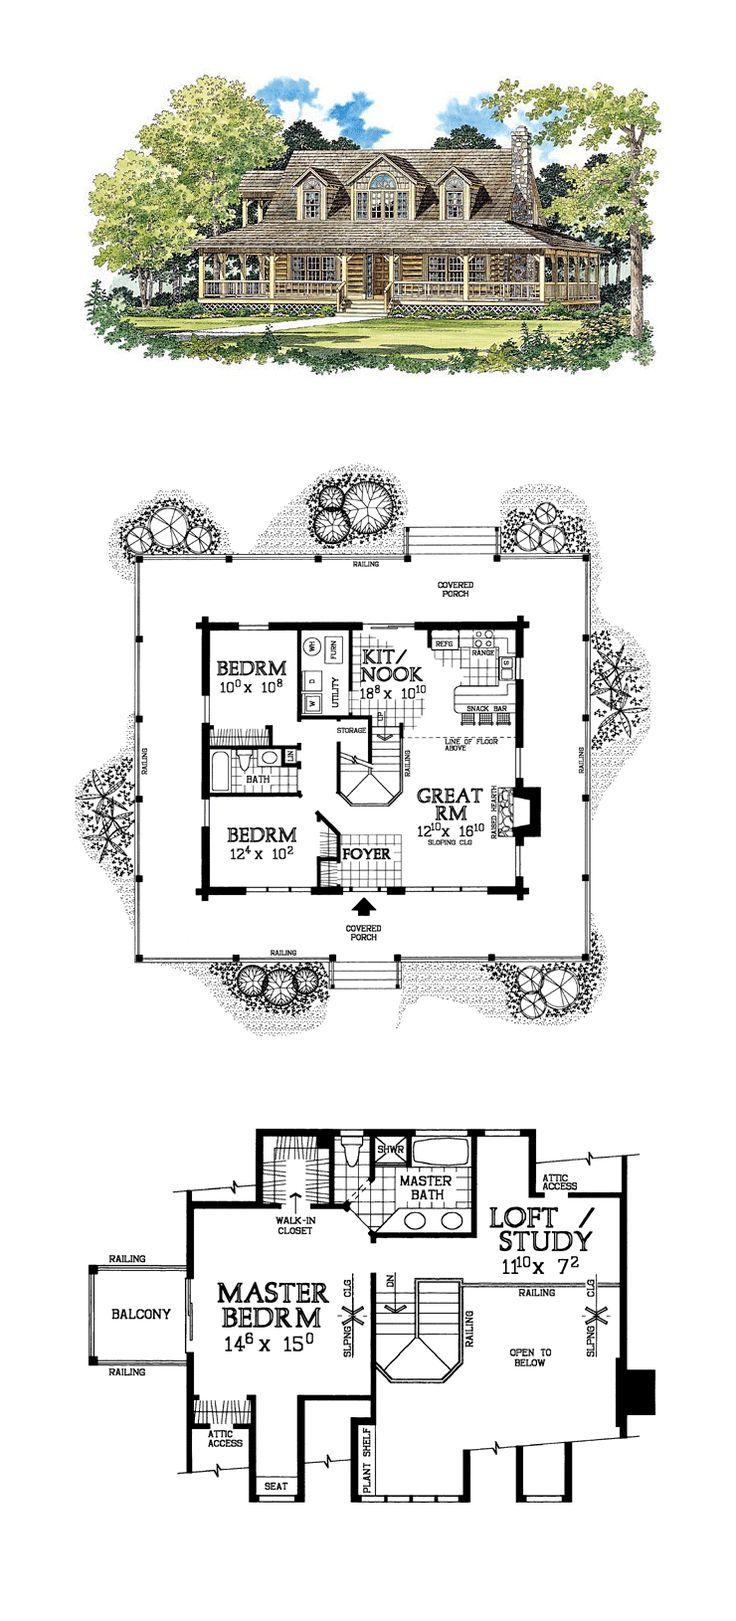 17 Best Images About Log Home Plans On Pinterest Decks